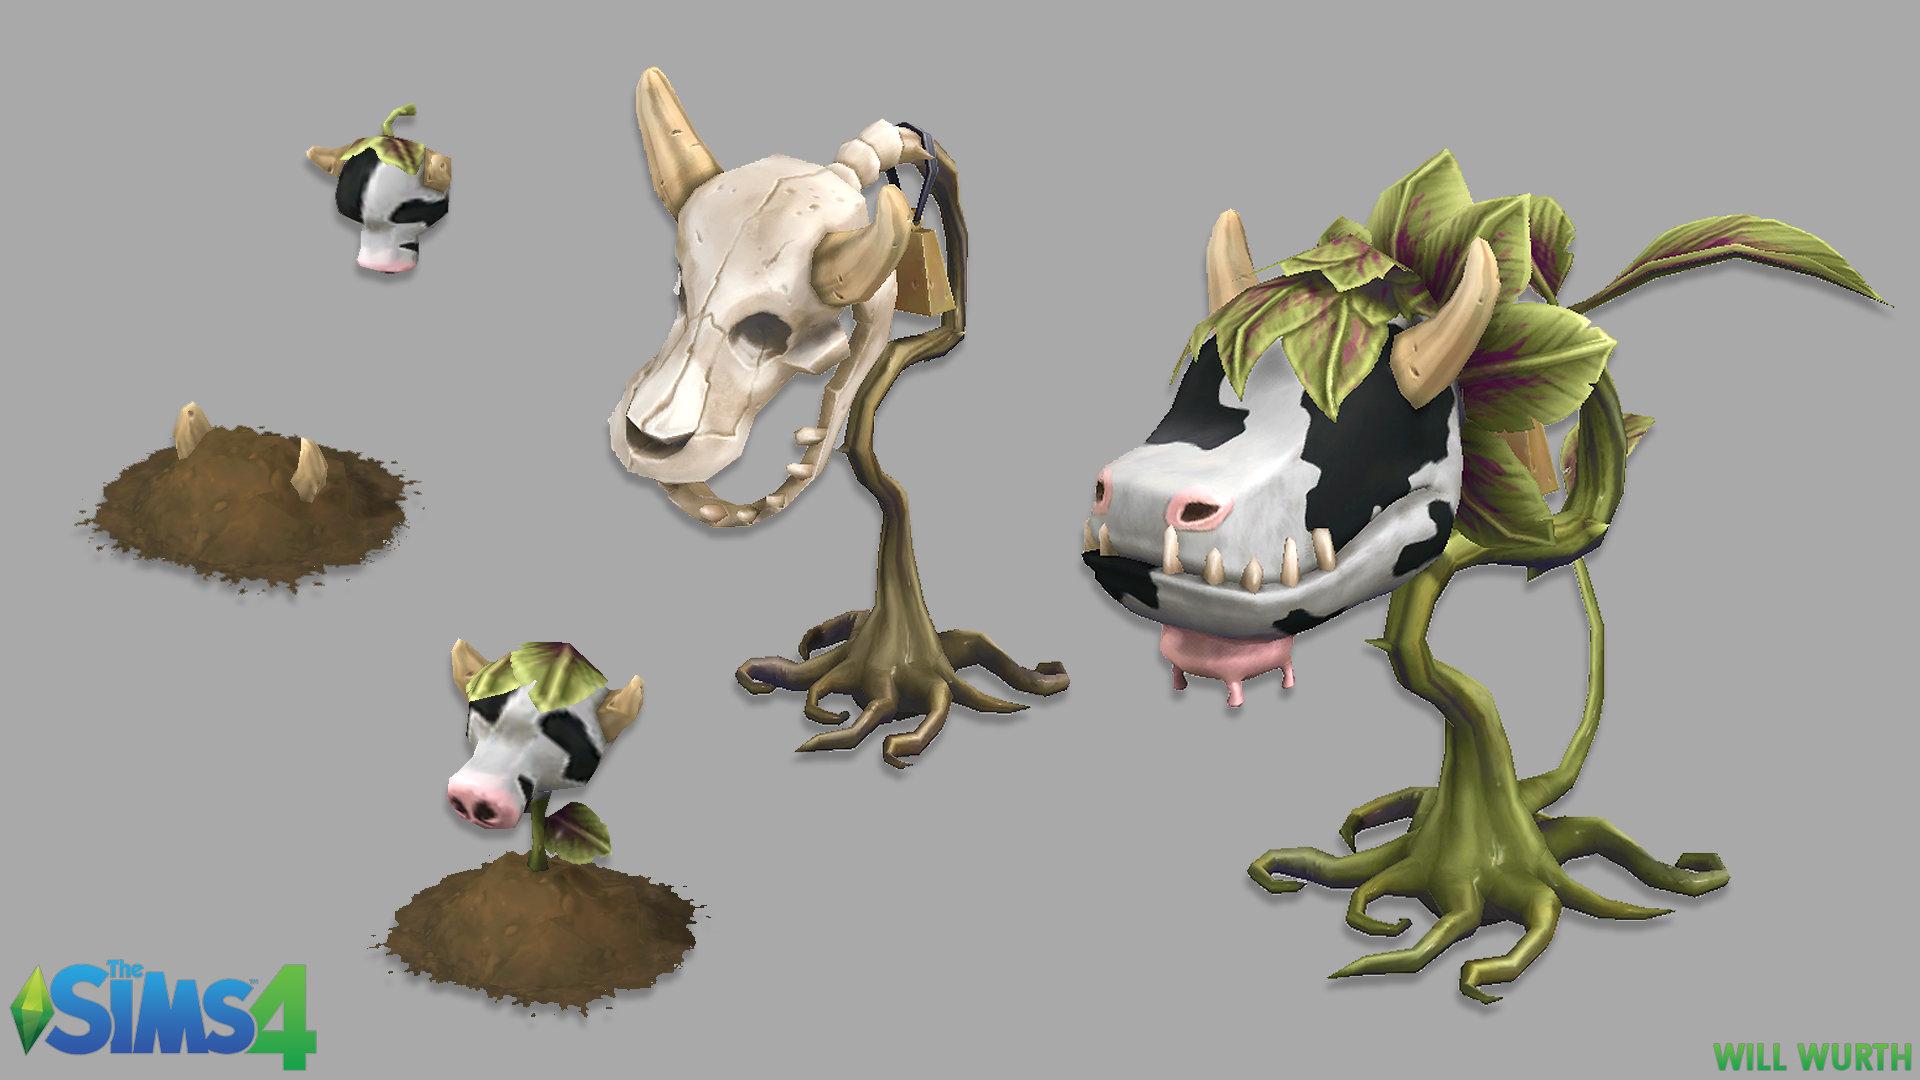 will-wurth-ts4-cowplant.jpg?1428389401